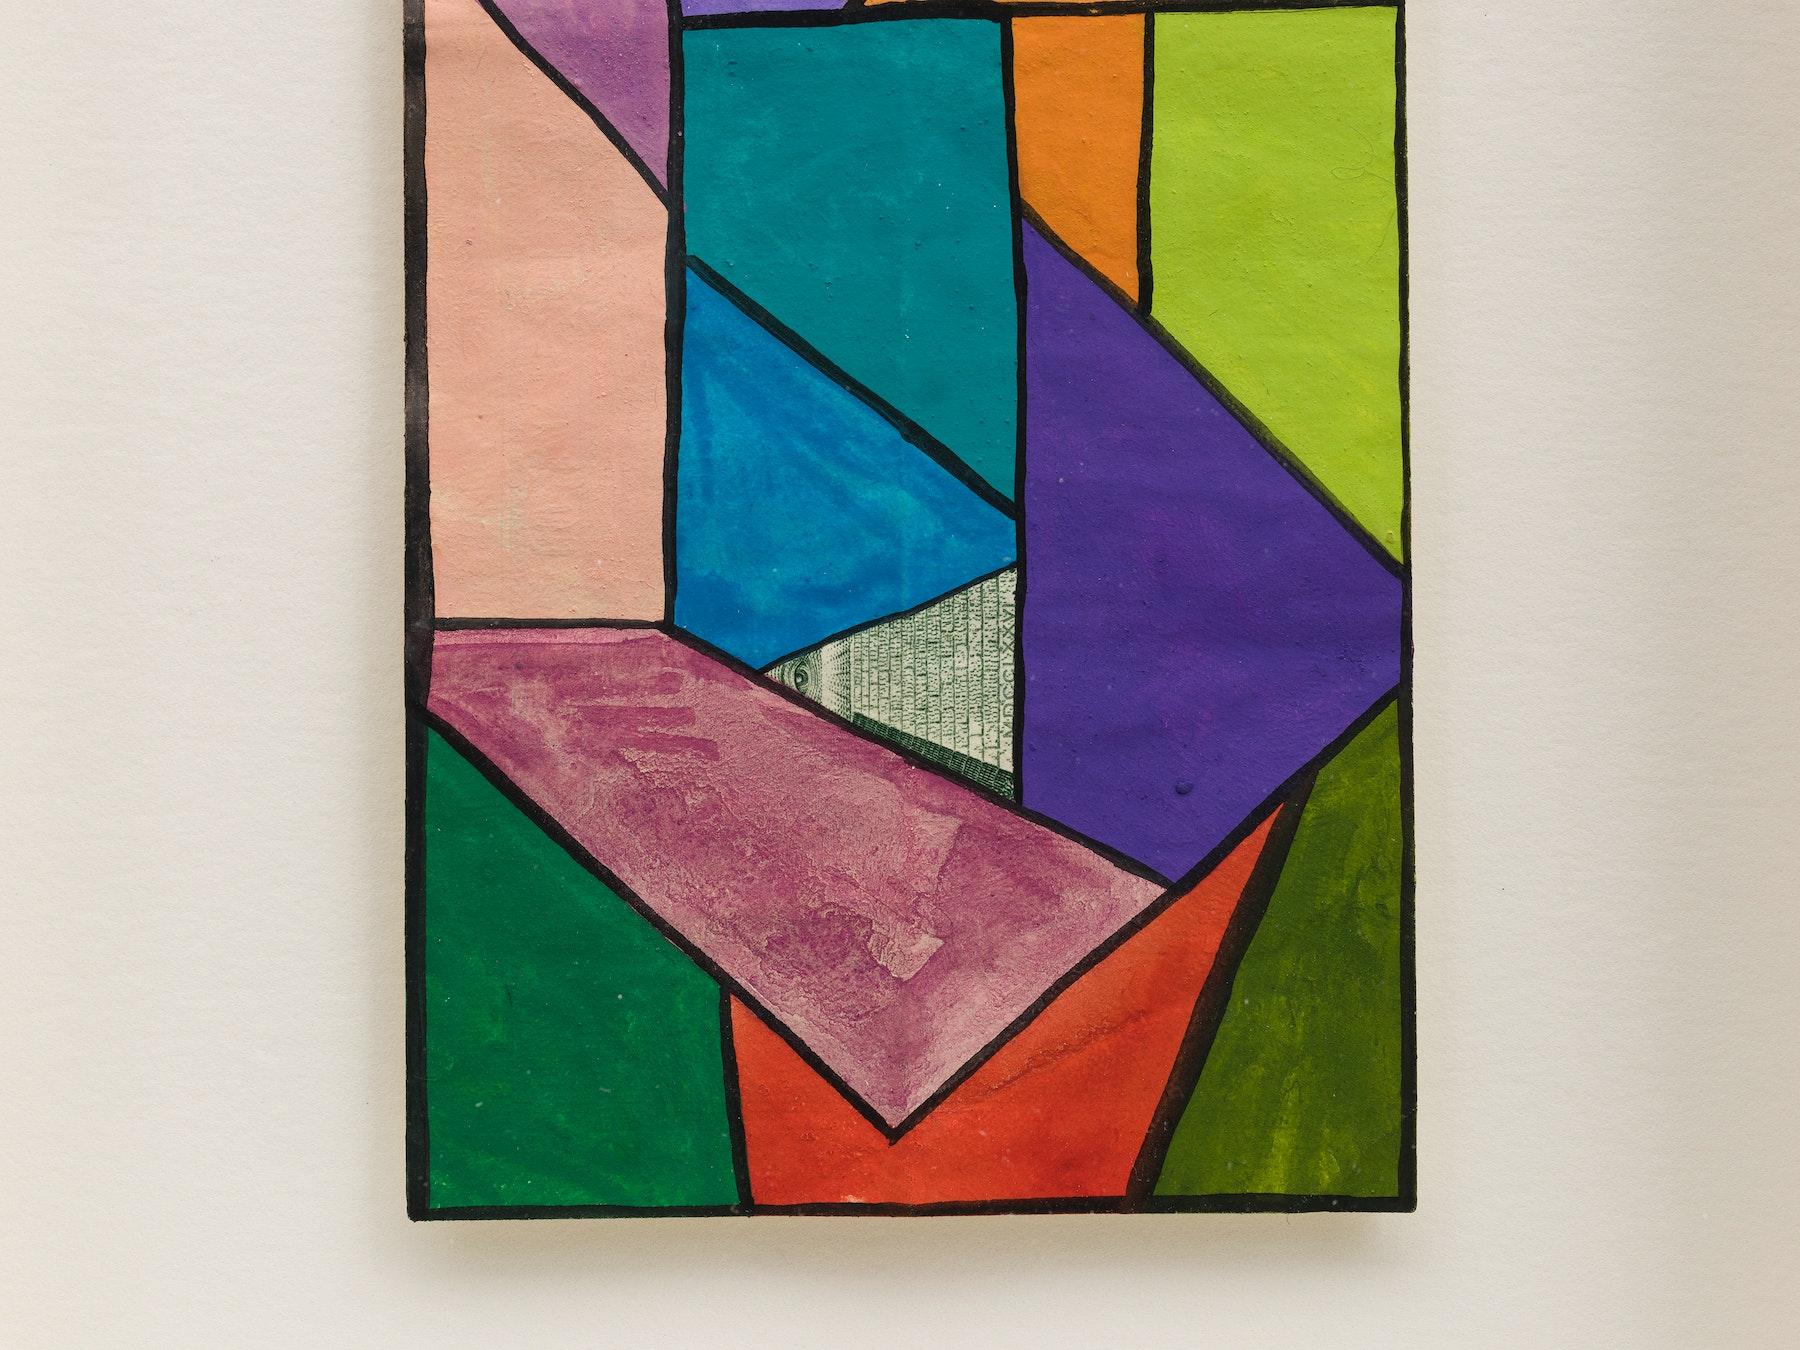 "Sarah Cain ""$ talisman,"" 2021 Acrylic on dollar bill 9 ¹⁄₂"" x 6 ¹⁄₄"" x 1 ³⁄₄"" [HxWxD] (24.13 x 15.88 x 4.45 cm) Inventory #CAS155 Courtesy of the artist and Vielmetter Los Angeles Photo credit: Jeff McLane"